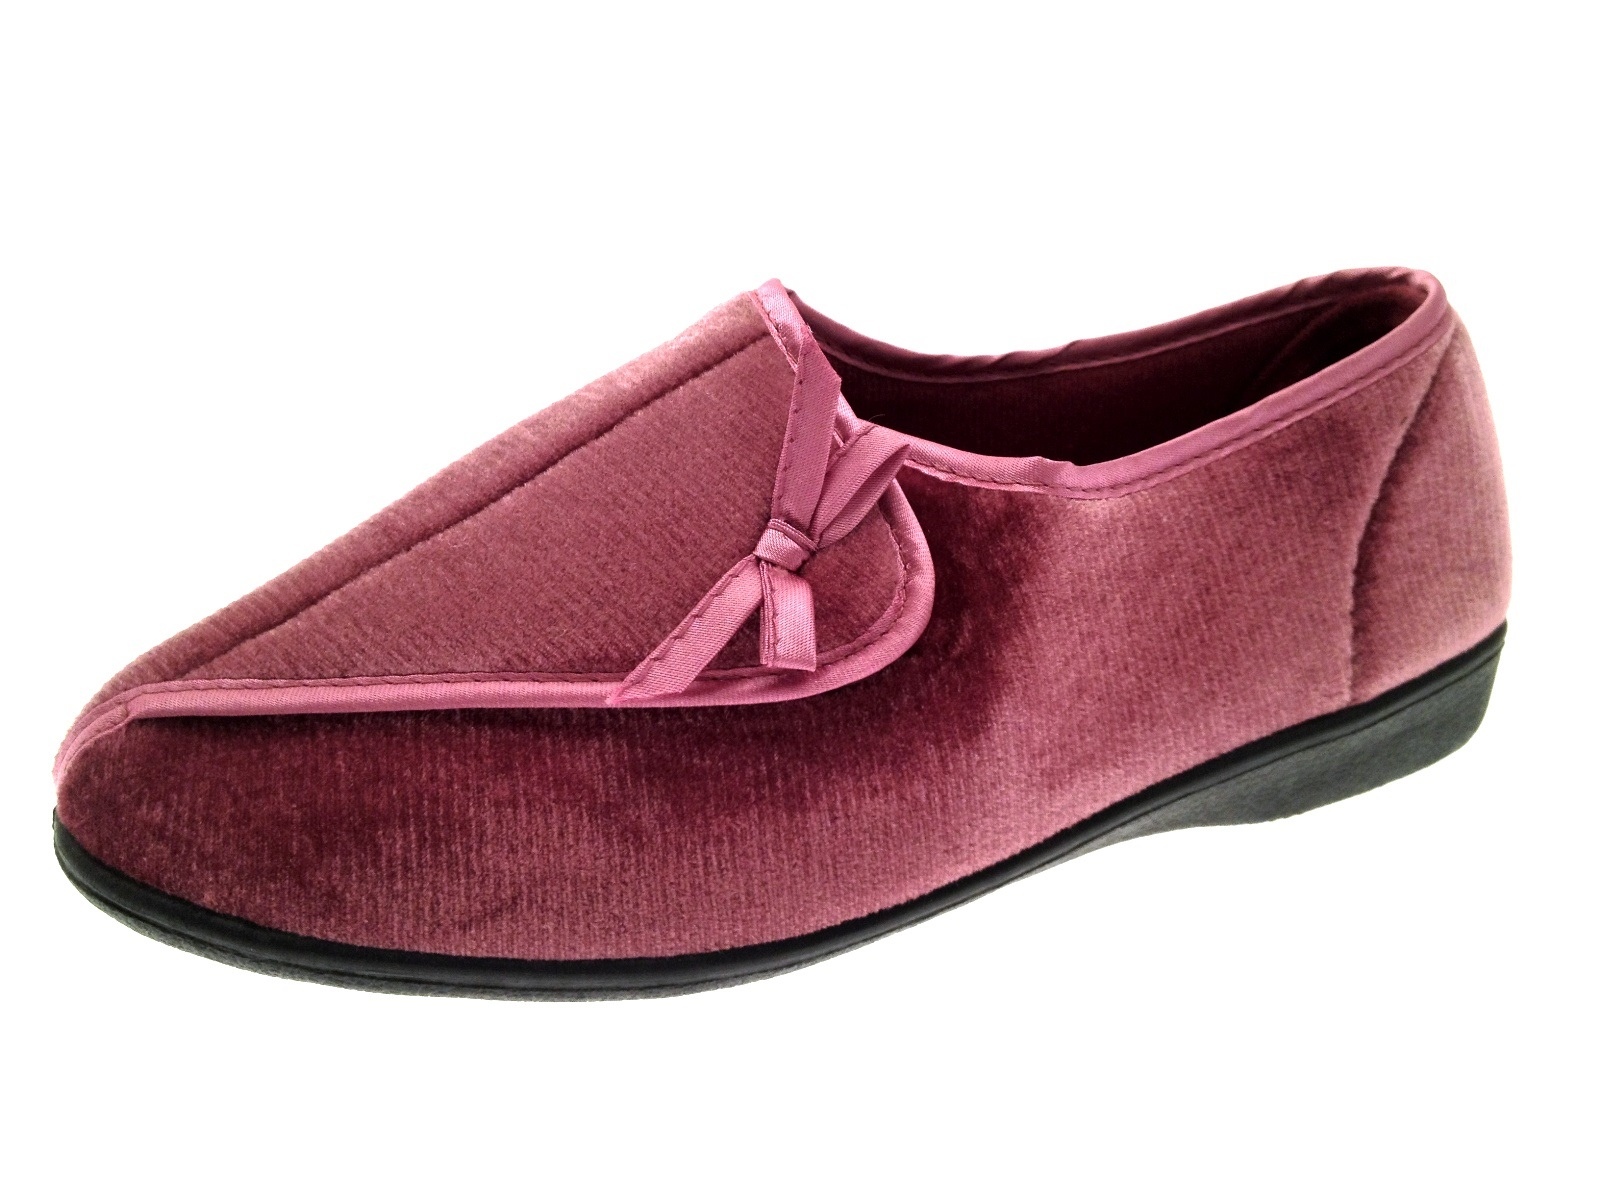 womens orthopaedic diabetic comfort slippers wider fit